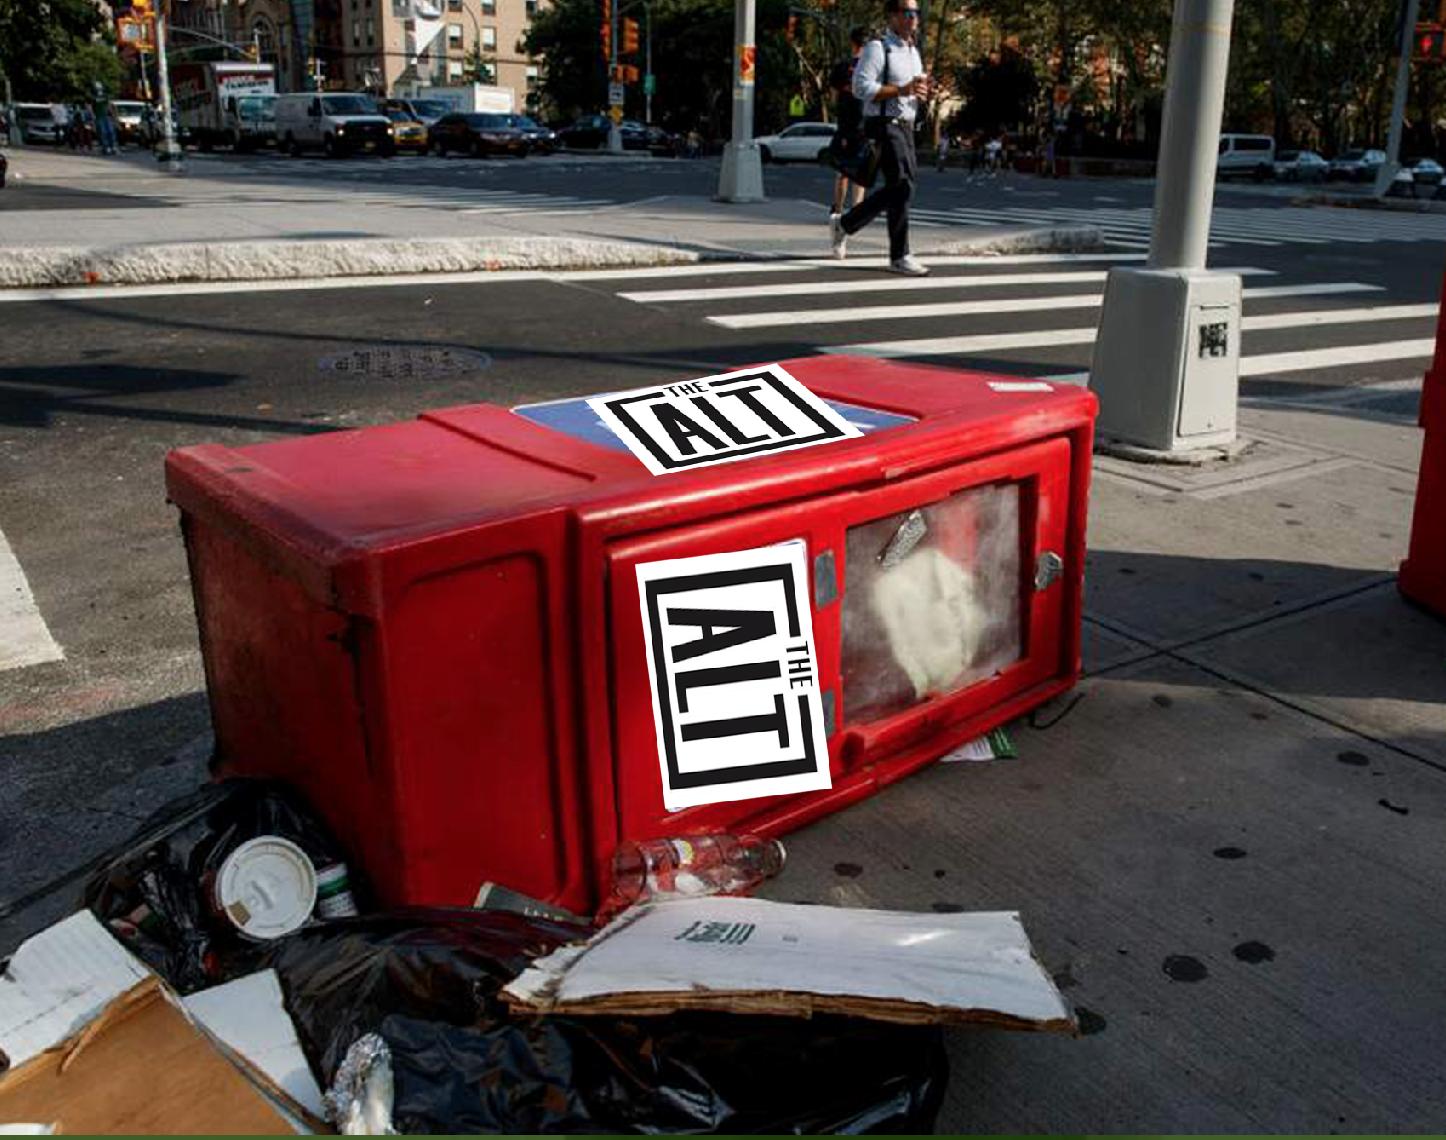 The Alt Shuts Down Just Weeks After Winning Best Local Newspaper…Sad!